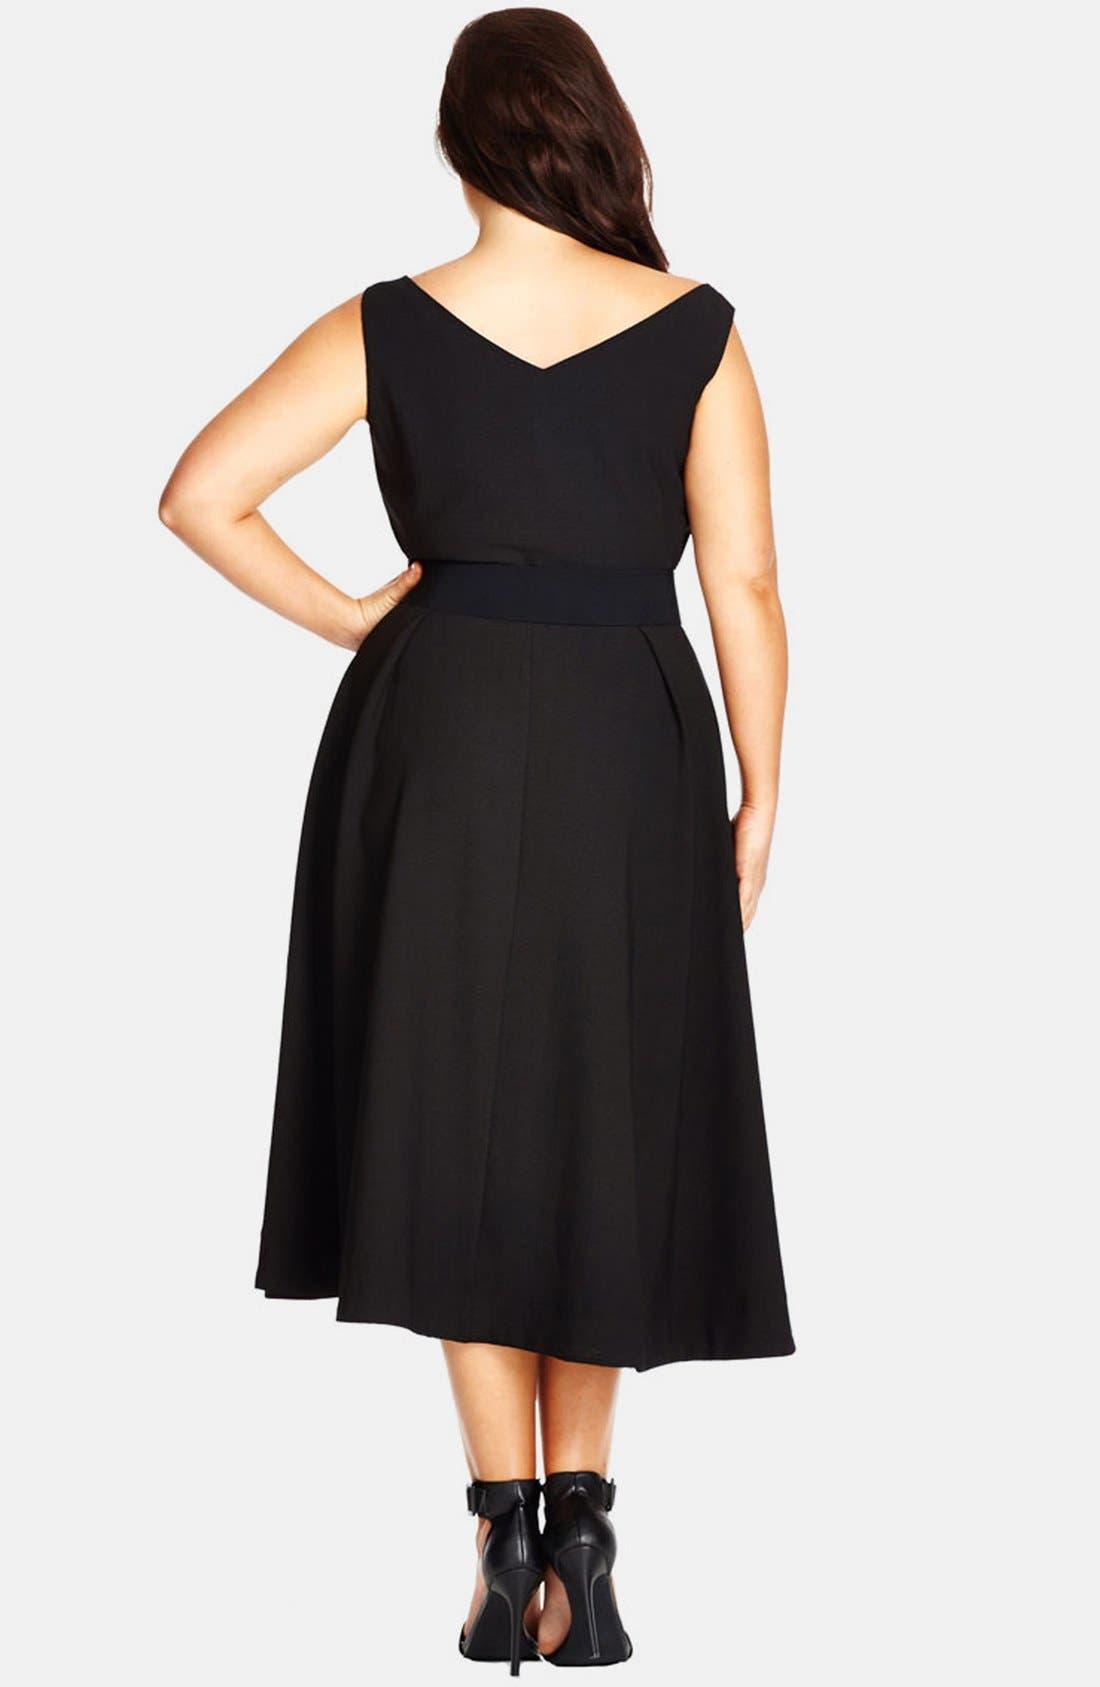 Belted Sweetheart Neck Tea Length Dress,                             Alternate thumbnail 2, color,                             001